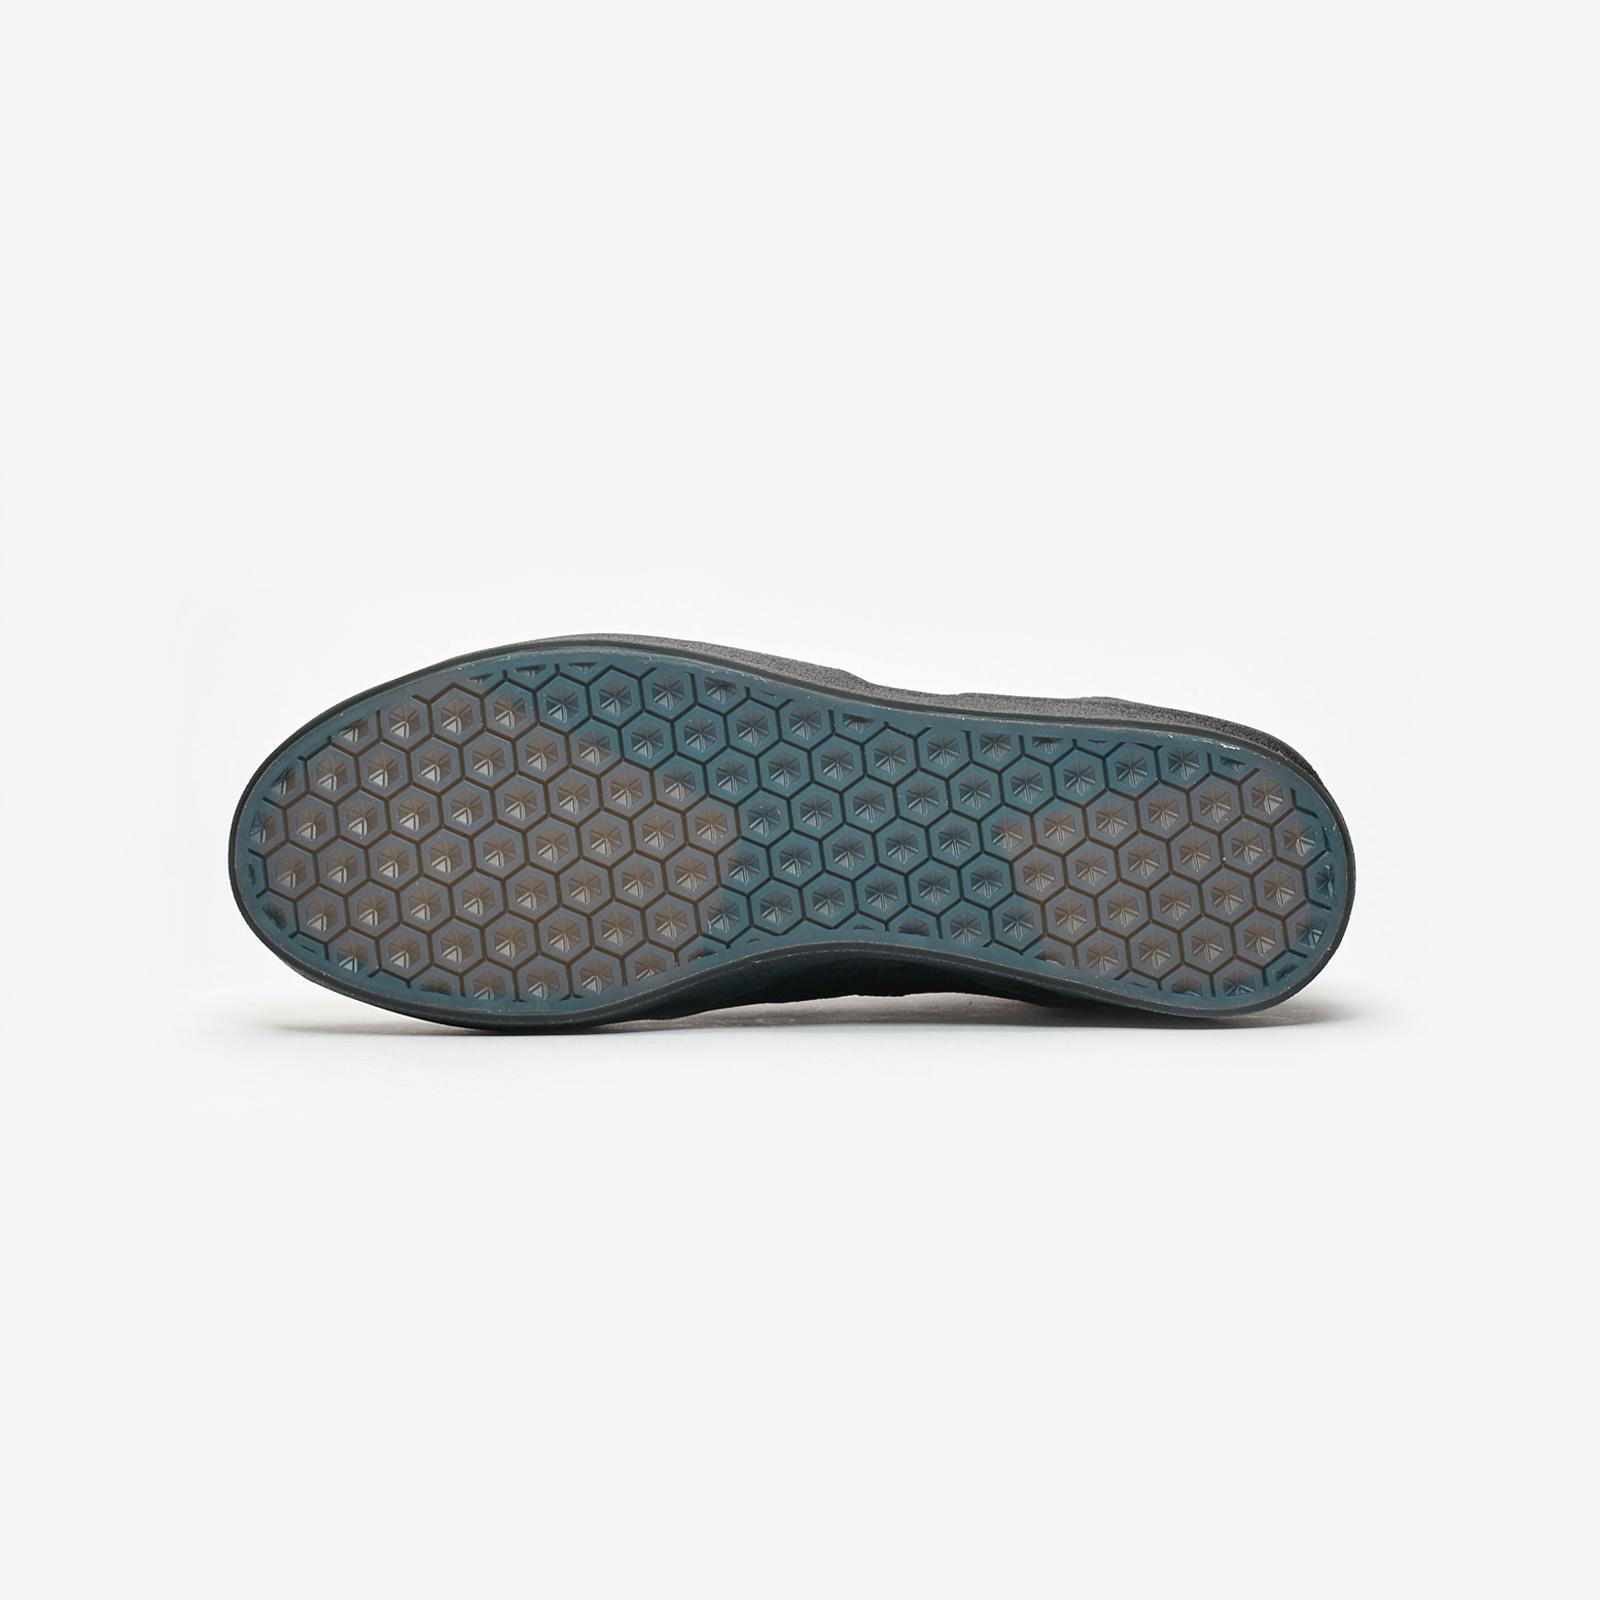 adidas 3ST.002 x BAPE Db3003 Sneakersnstuff | sneakers